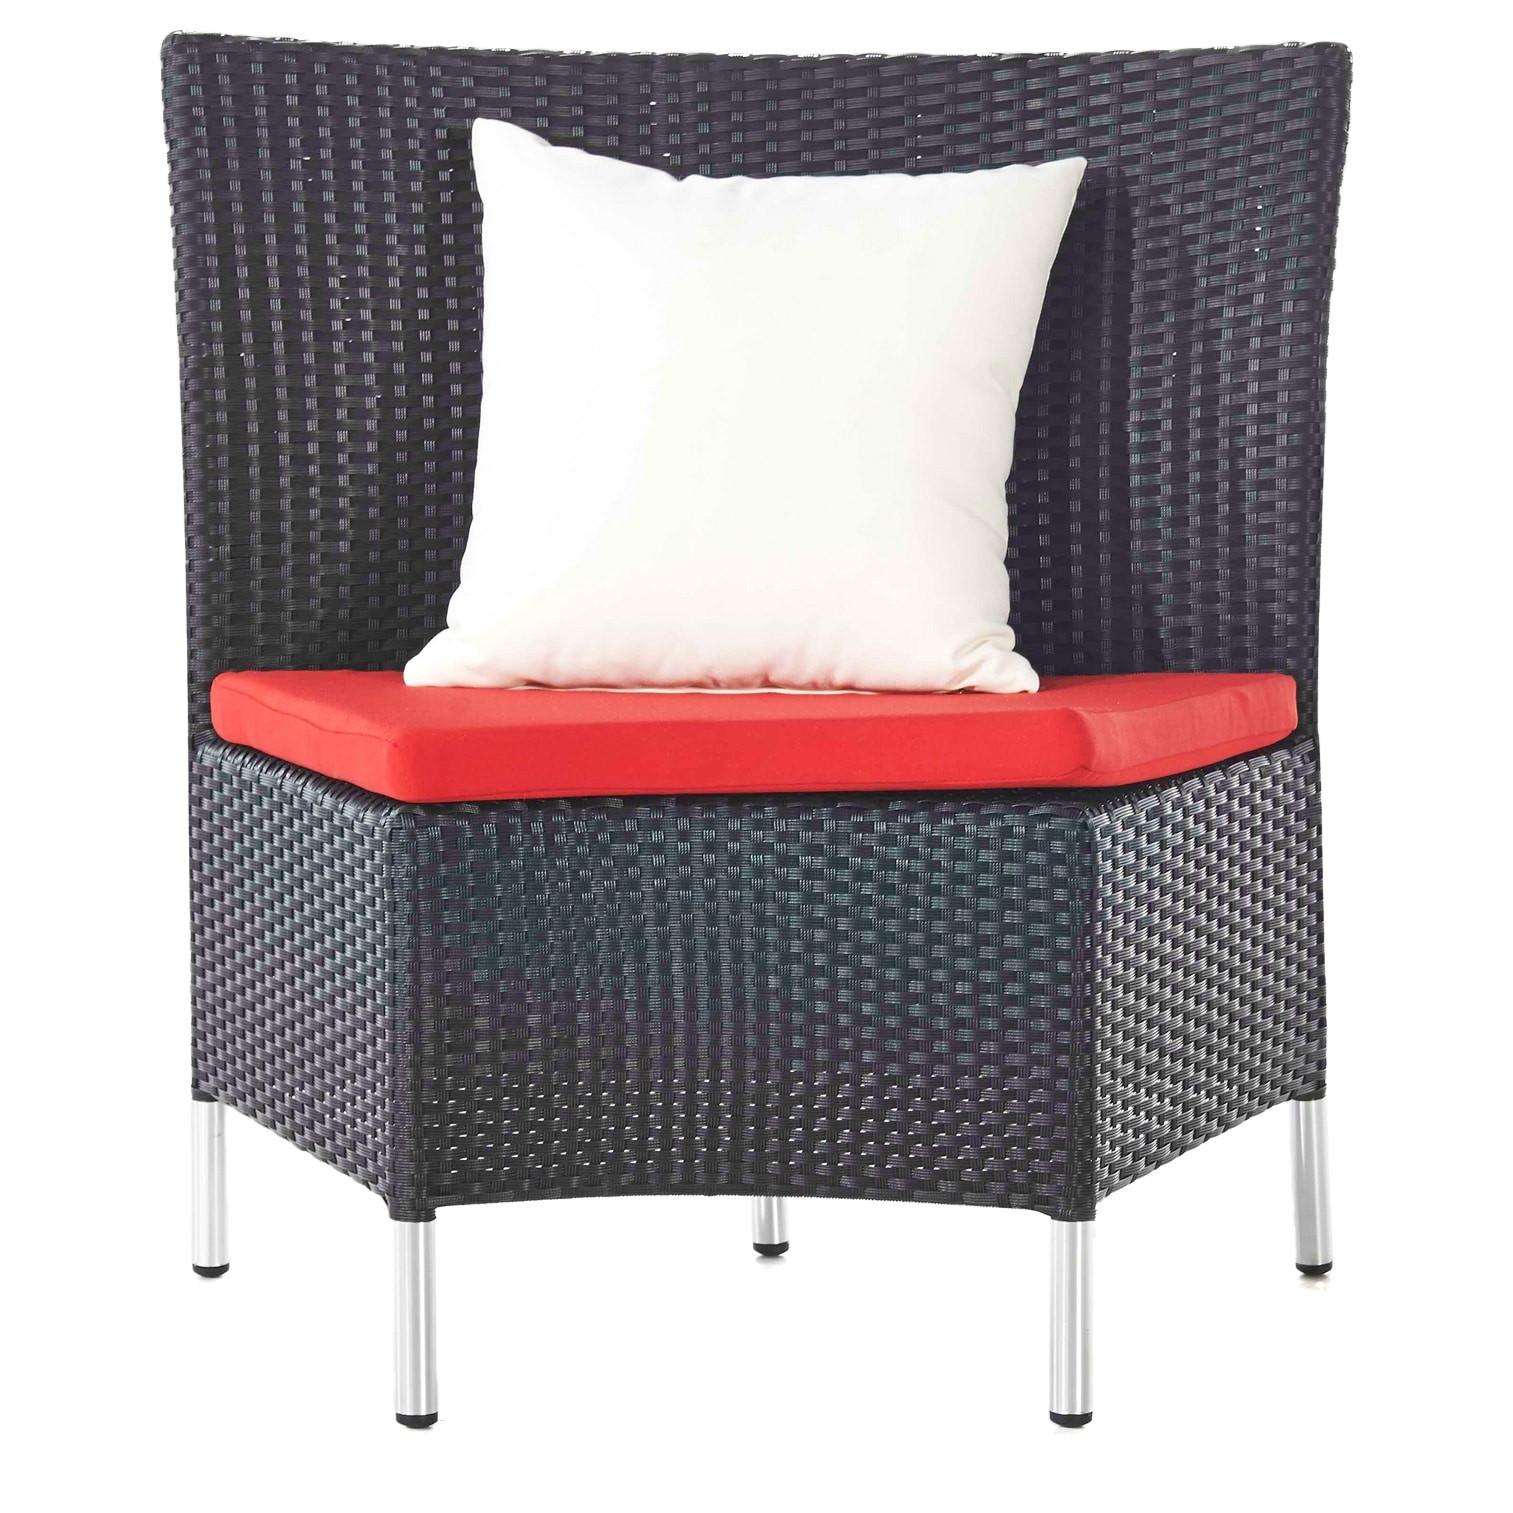 Plastic Caps for Patio Chair Legs Wrought Iron Patio Furniture Caps